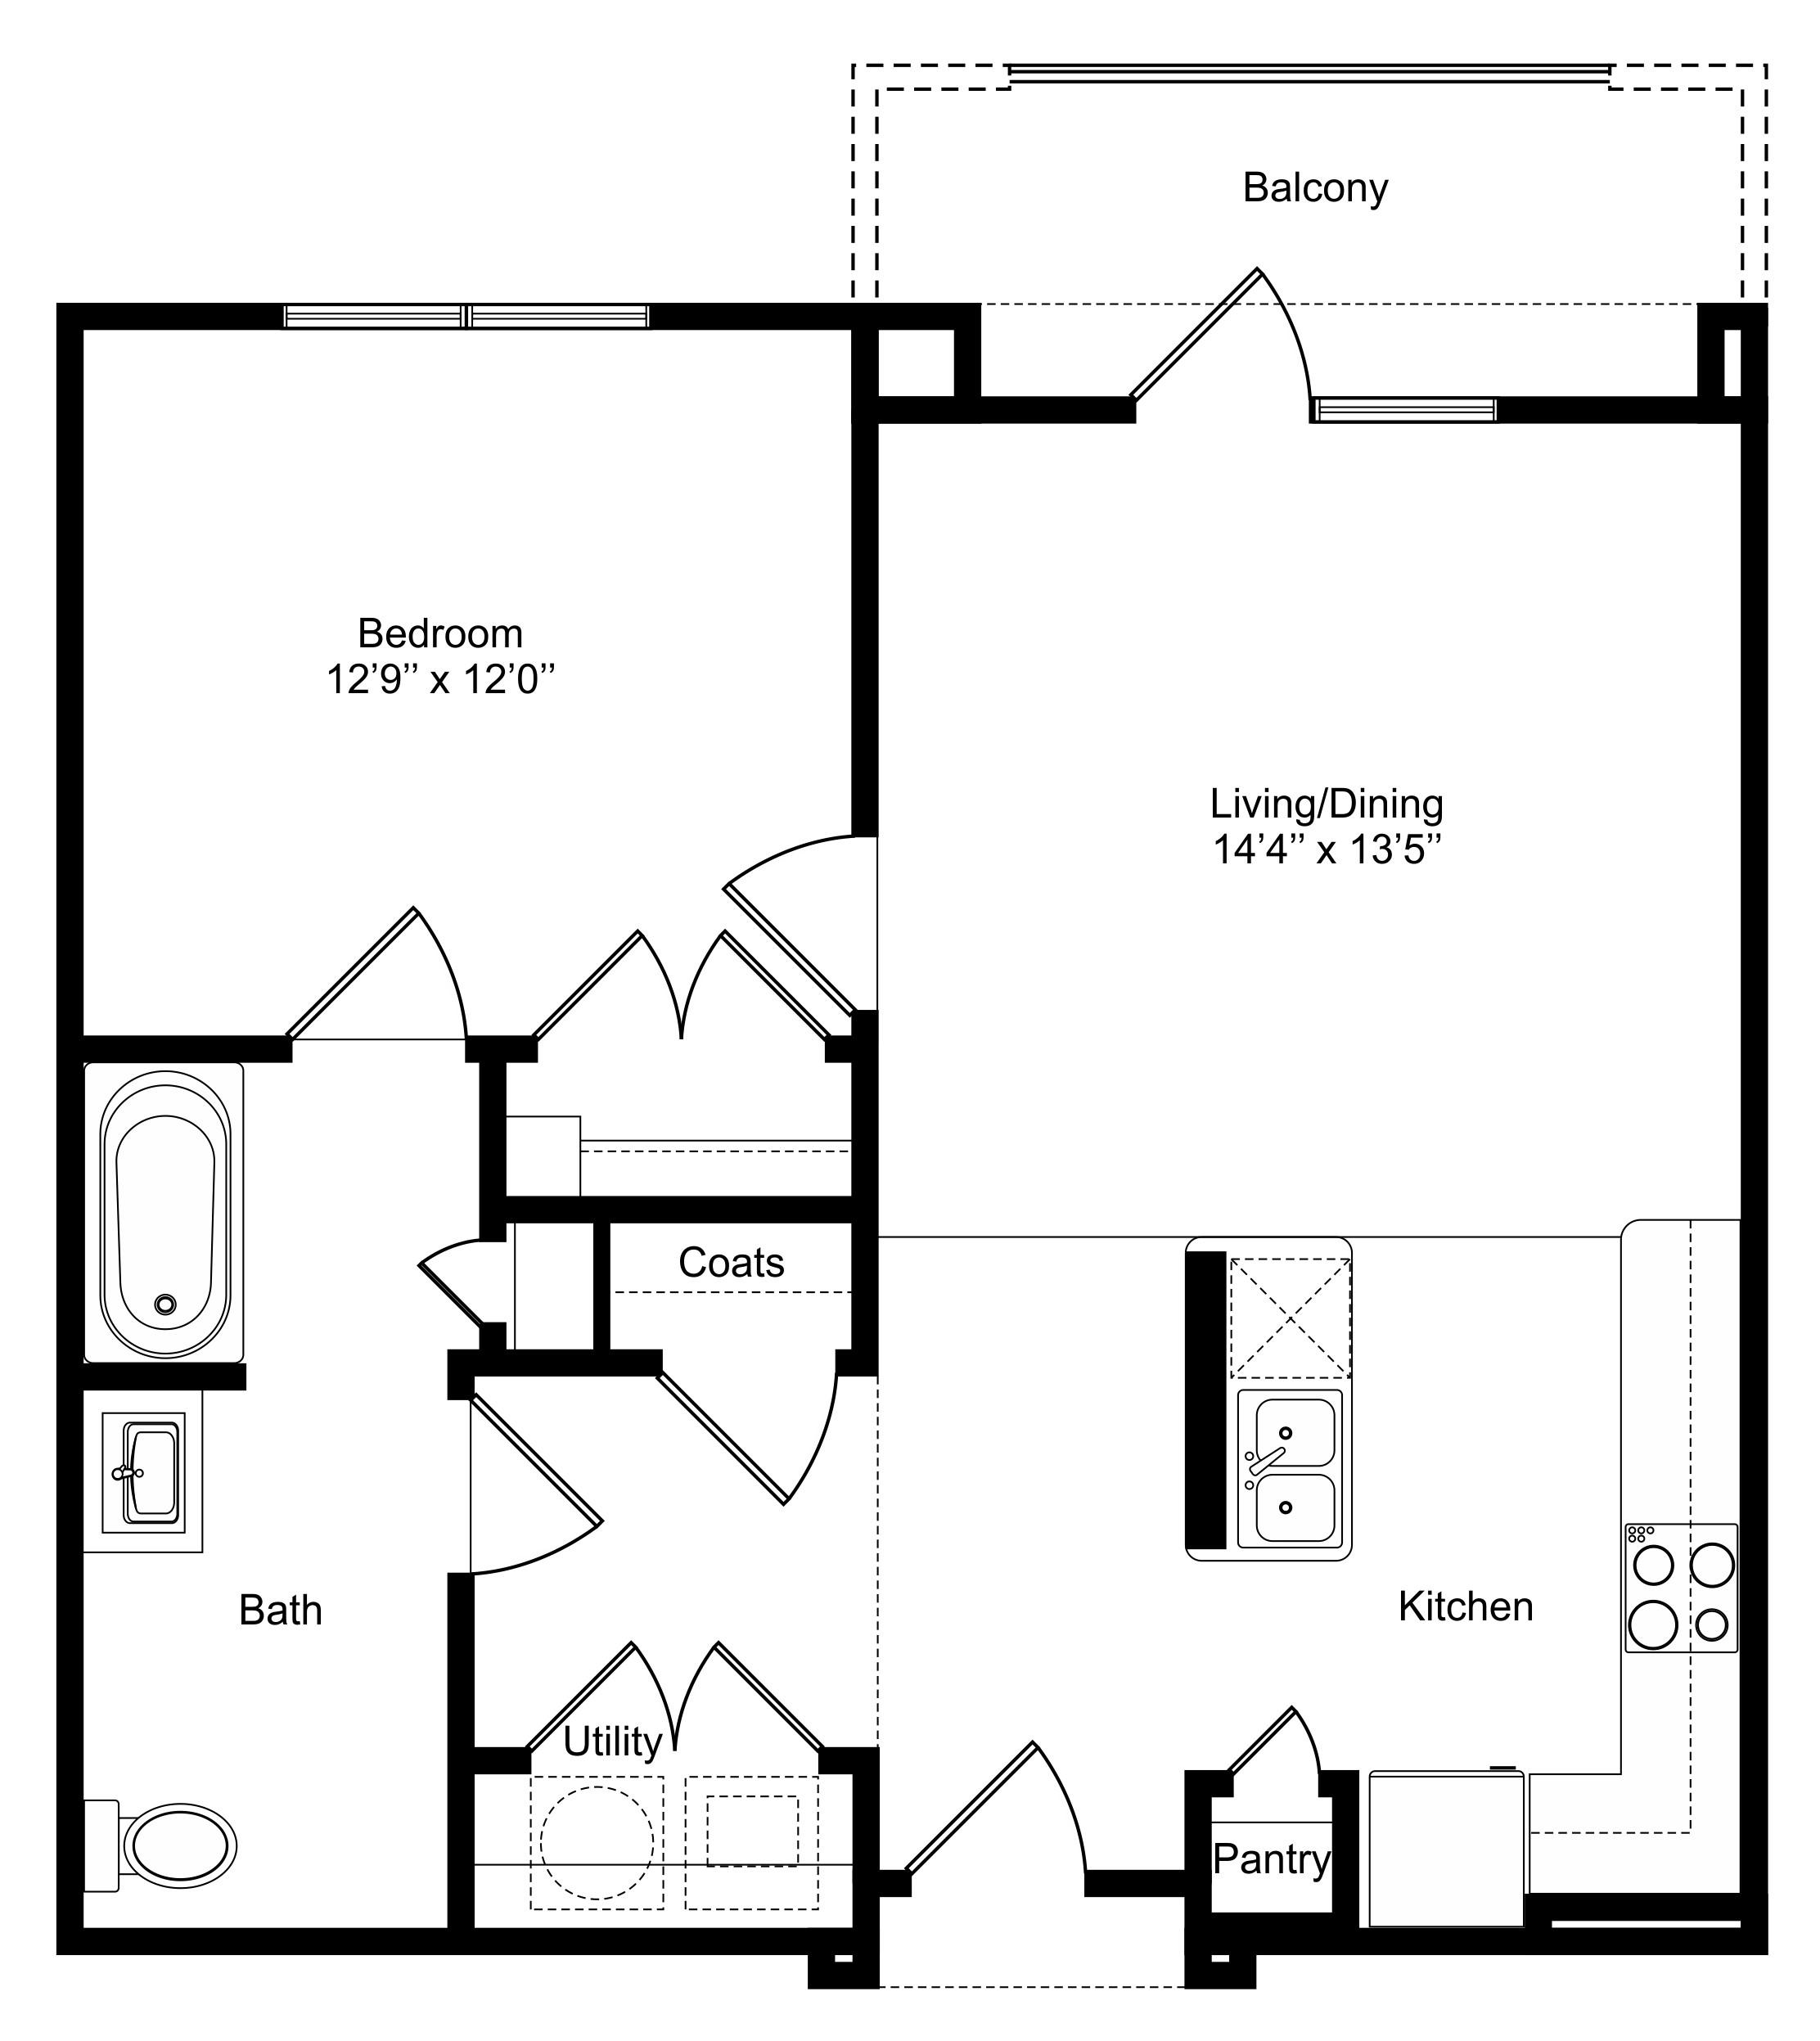 Floorplan - A2a image